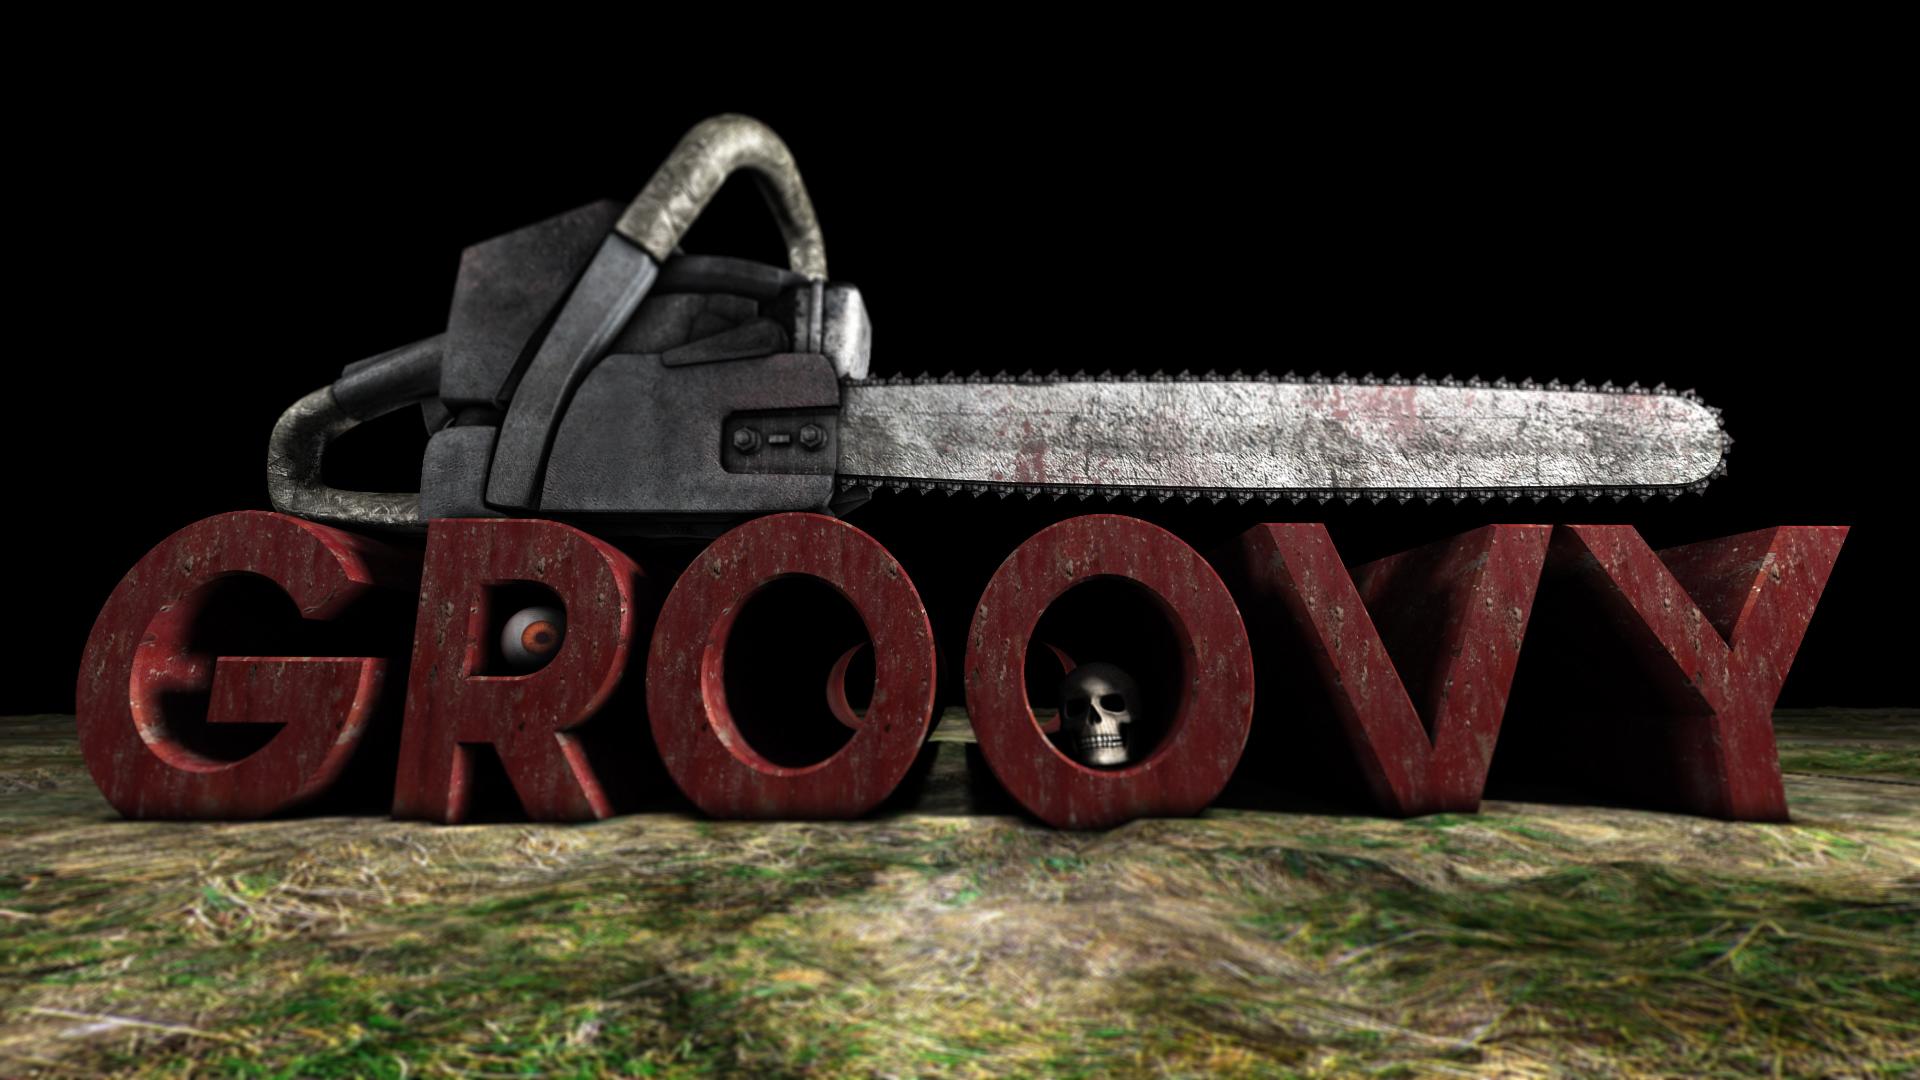 groovy001